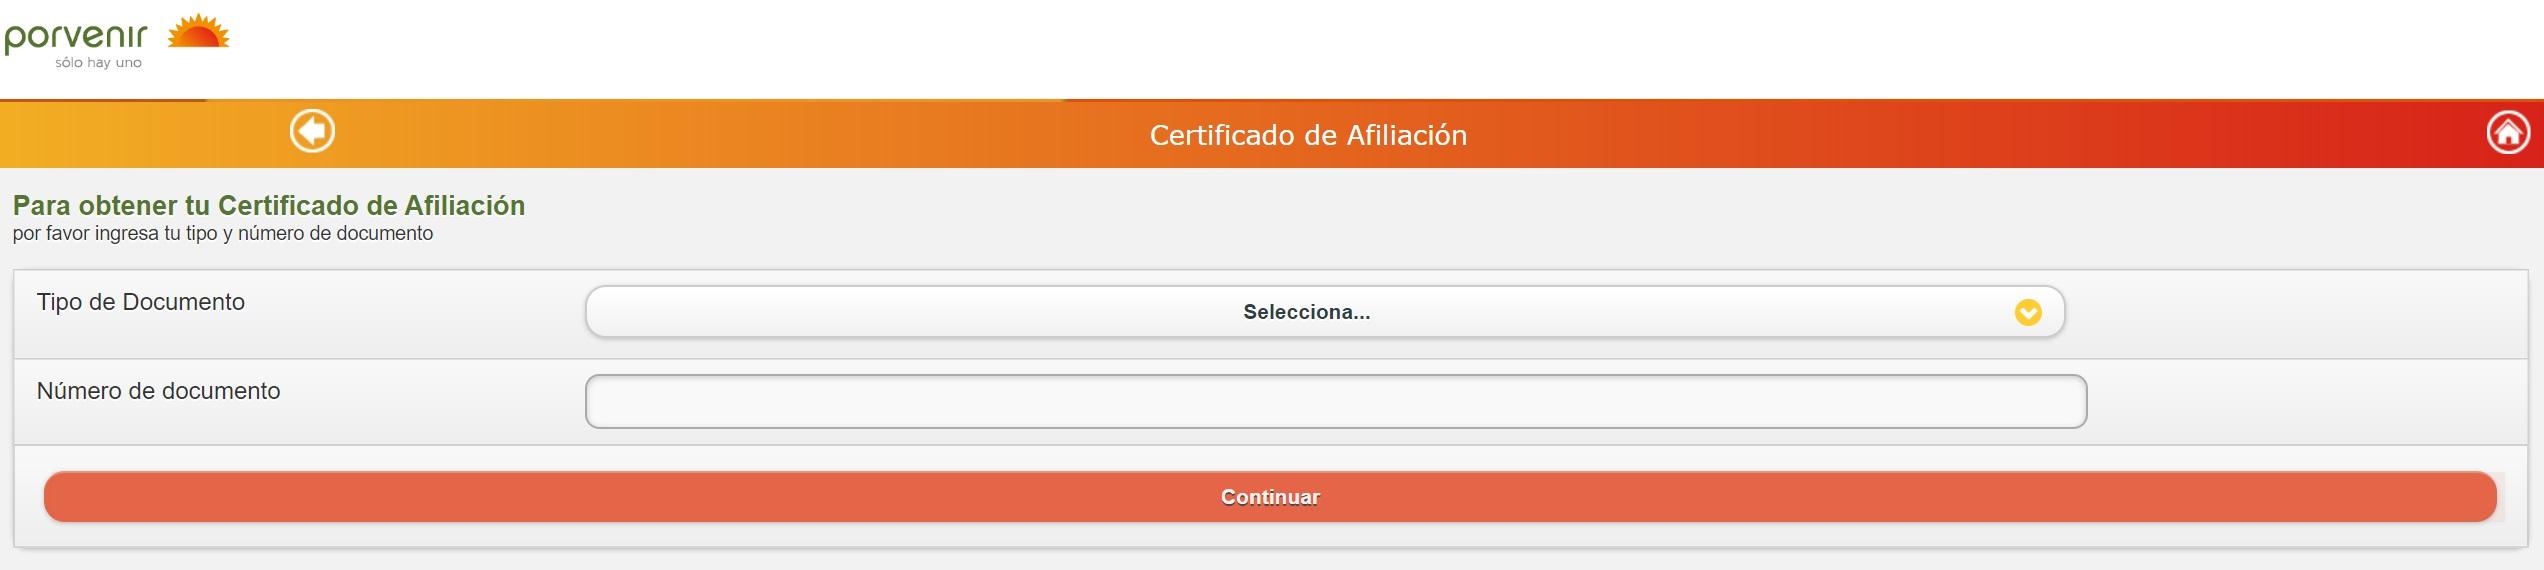 Descargar certificado de afiliación porvenir